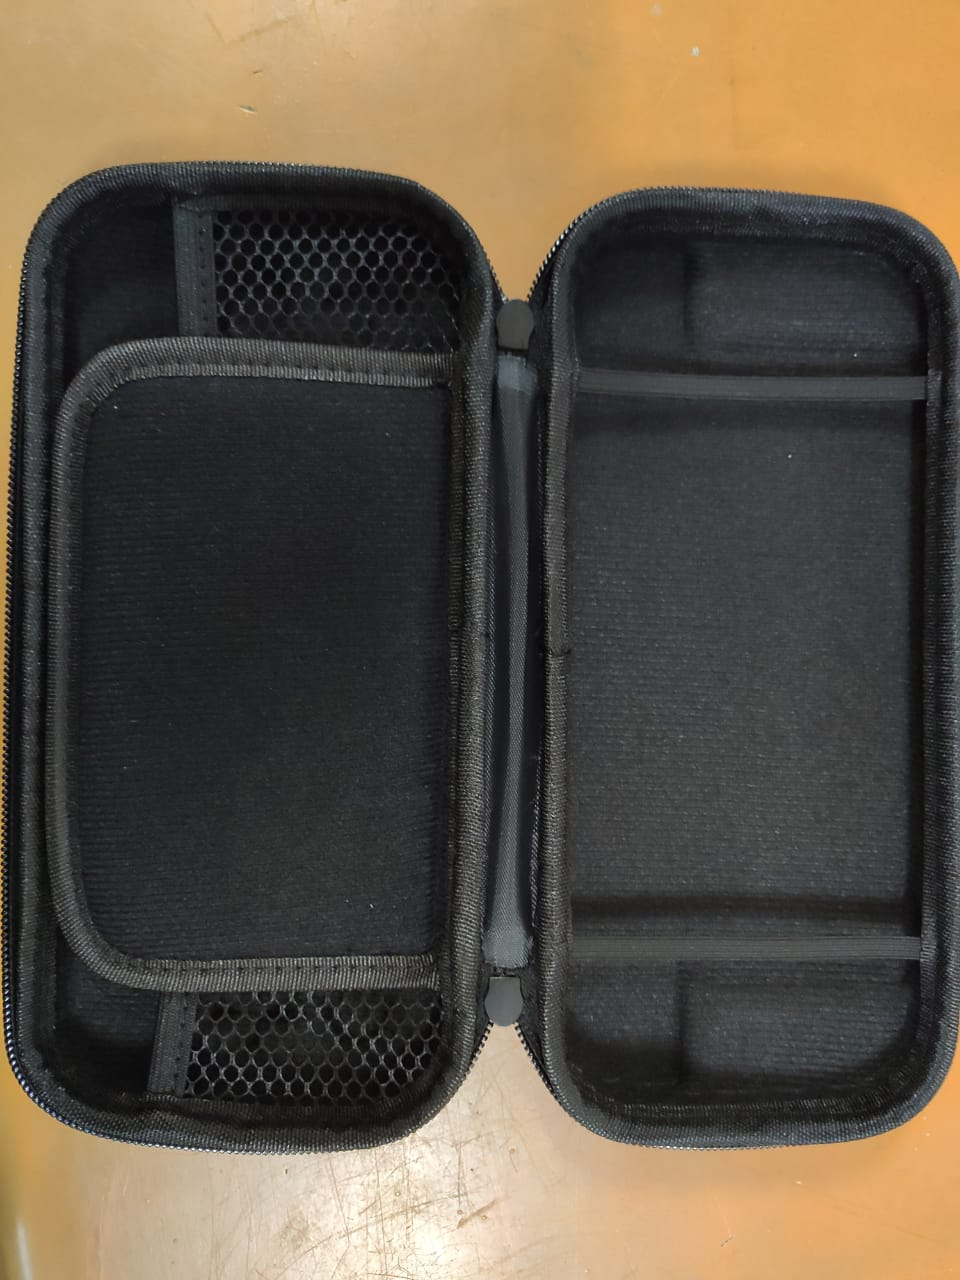 Hard Case Black - Nintendo Switch